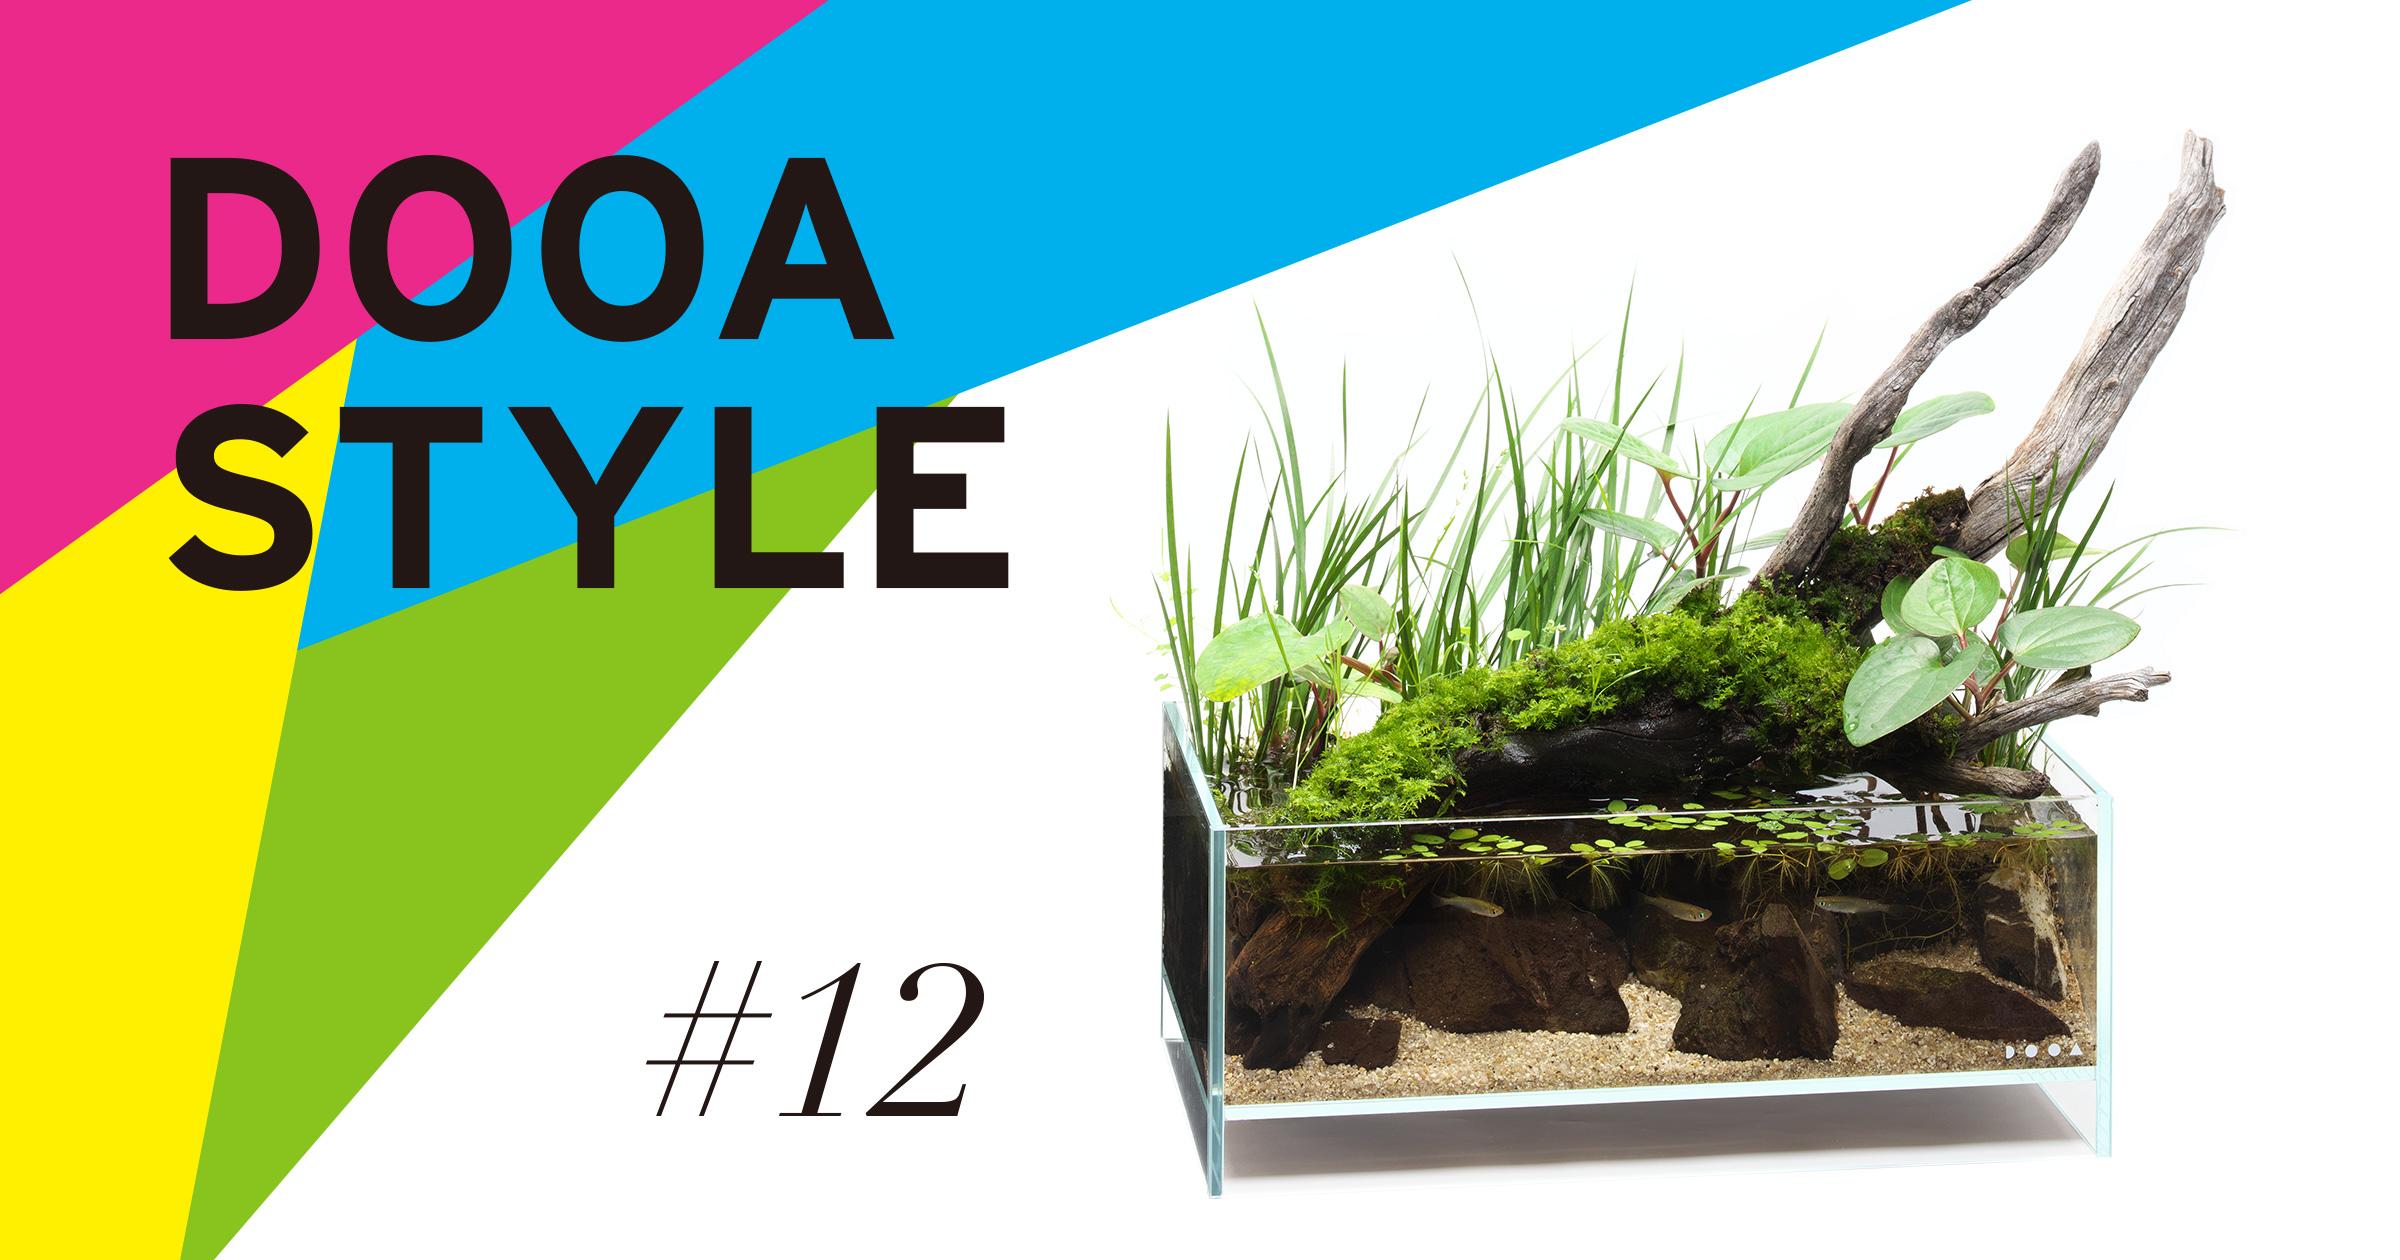 DOOA STYLE #12 流木に寄り添う初夏の原風景。